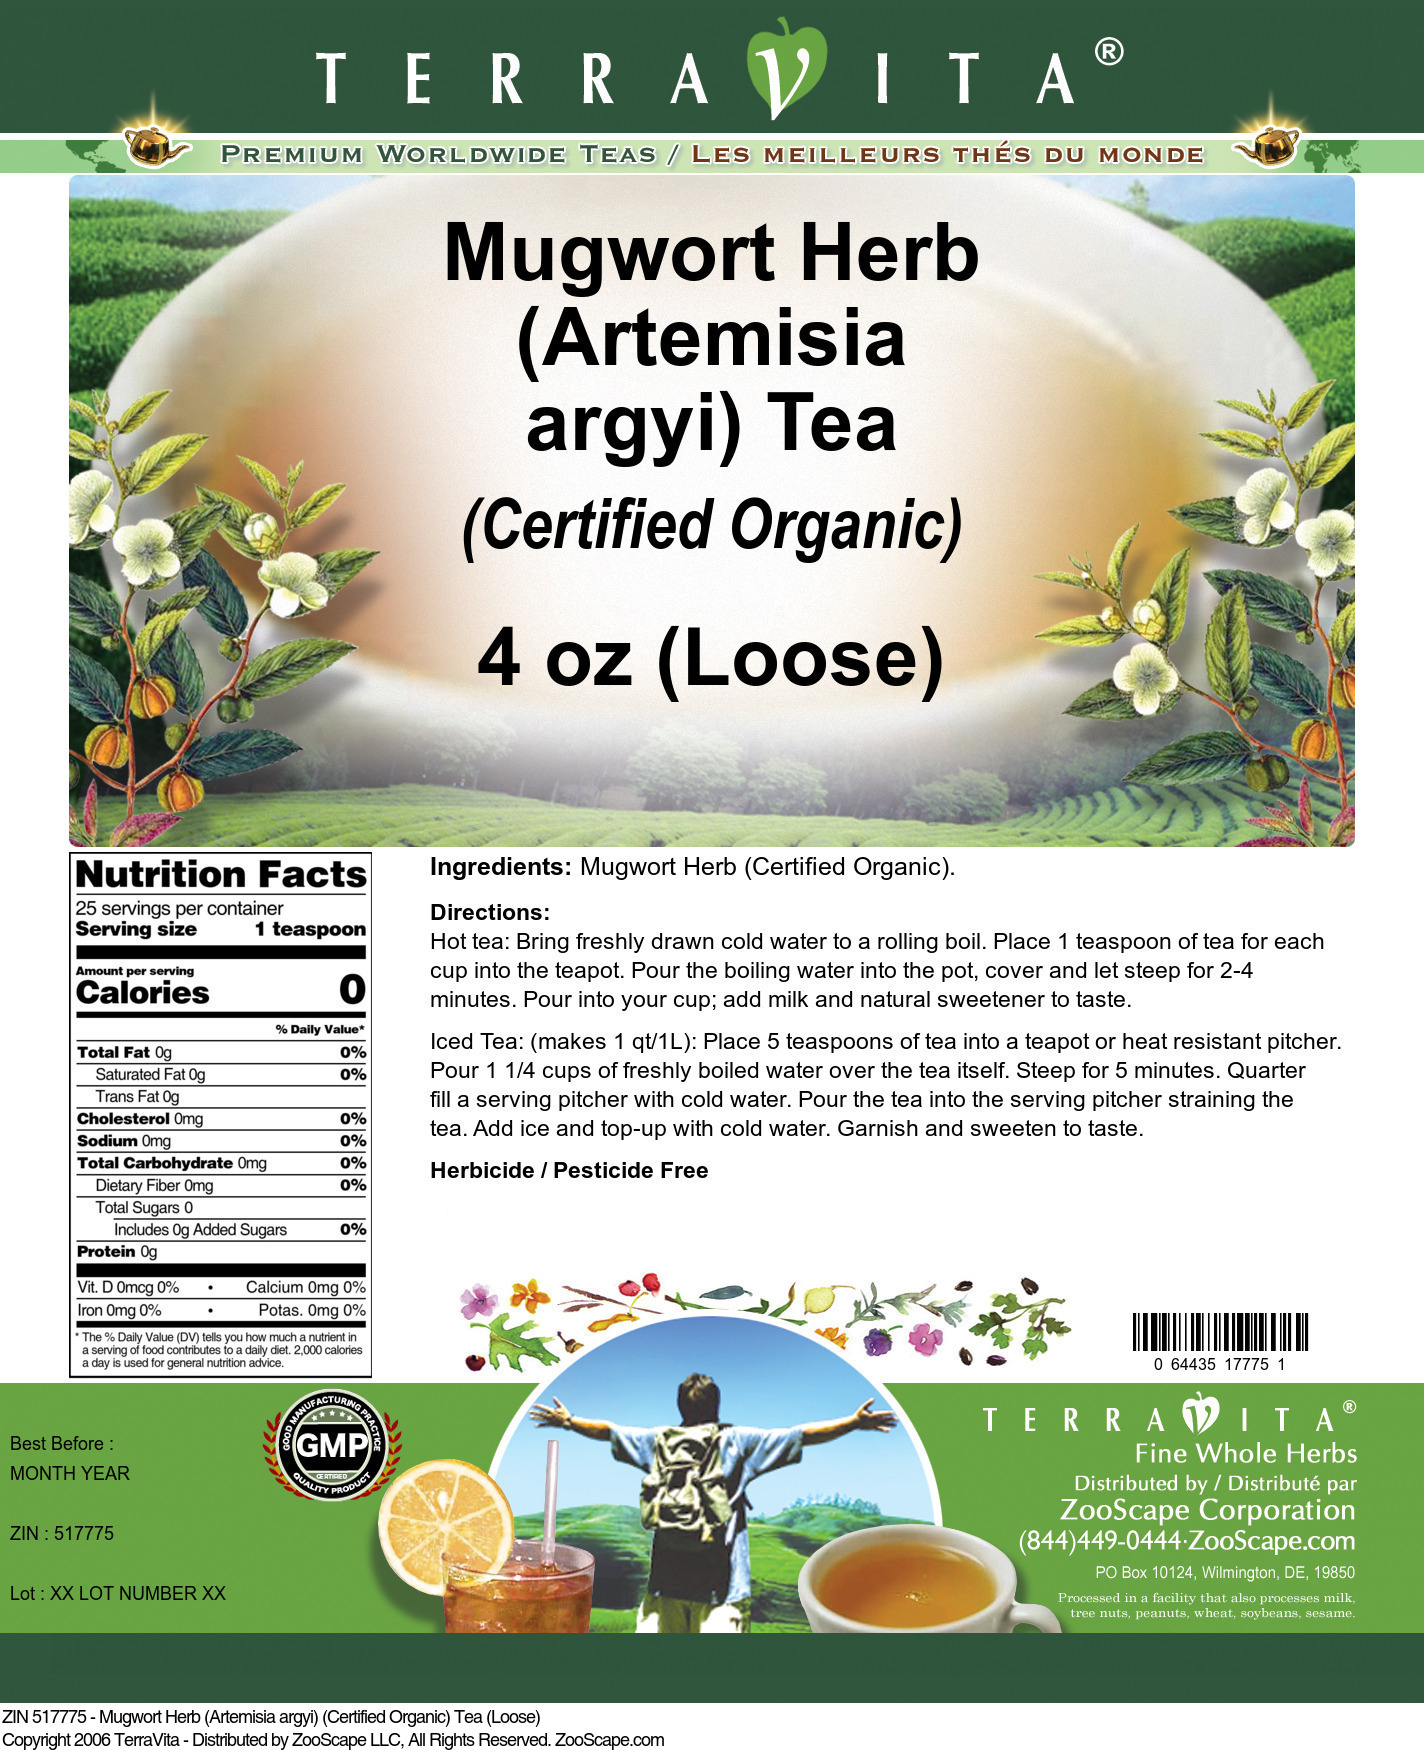 Mugwort Herb (Artemisia argyi) (Certified Organic) Tea (Loose)